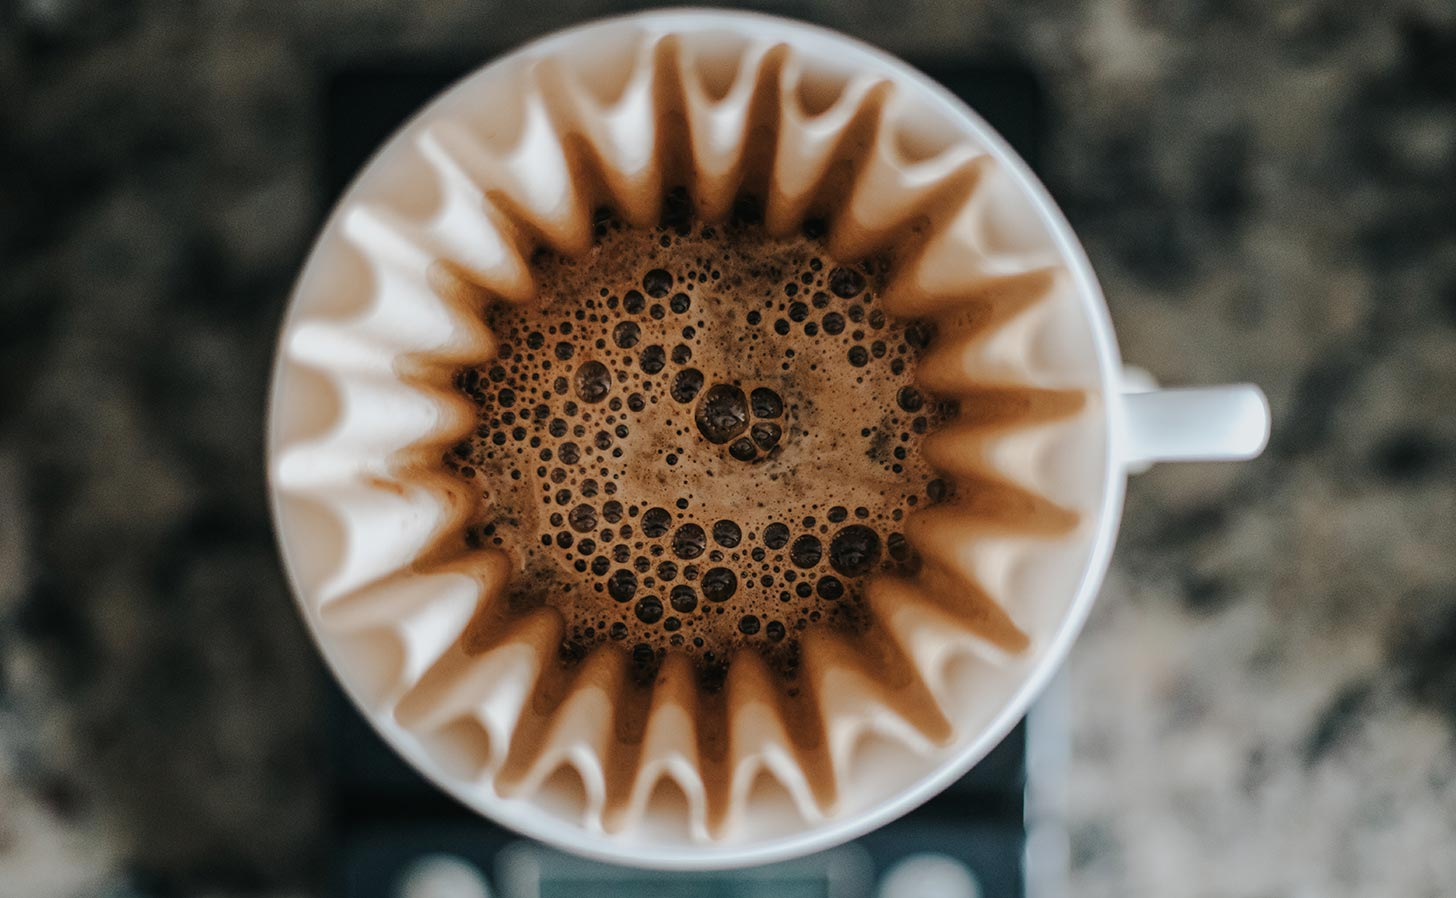 Kaffebryggning. Foto: Devin Avery / Unsplash